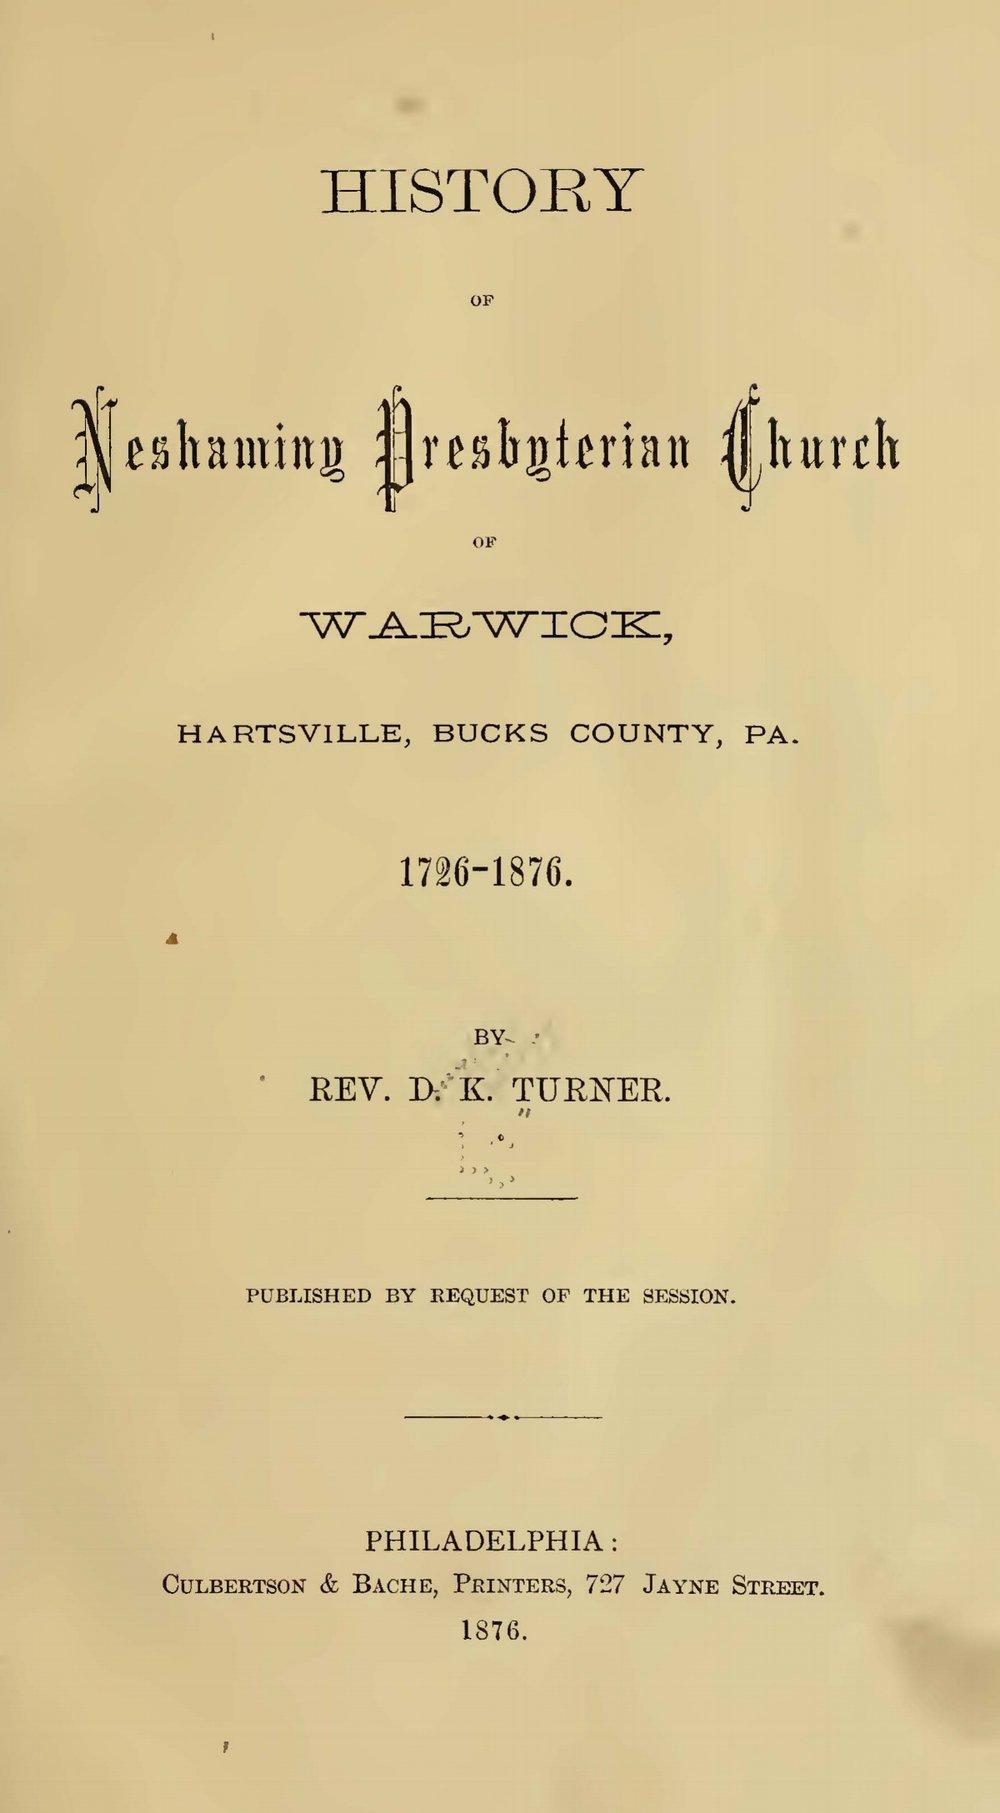 Turner, Douglas Kellogg, History of Neshaminy Presbyterian Church Title Page.jpg